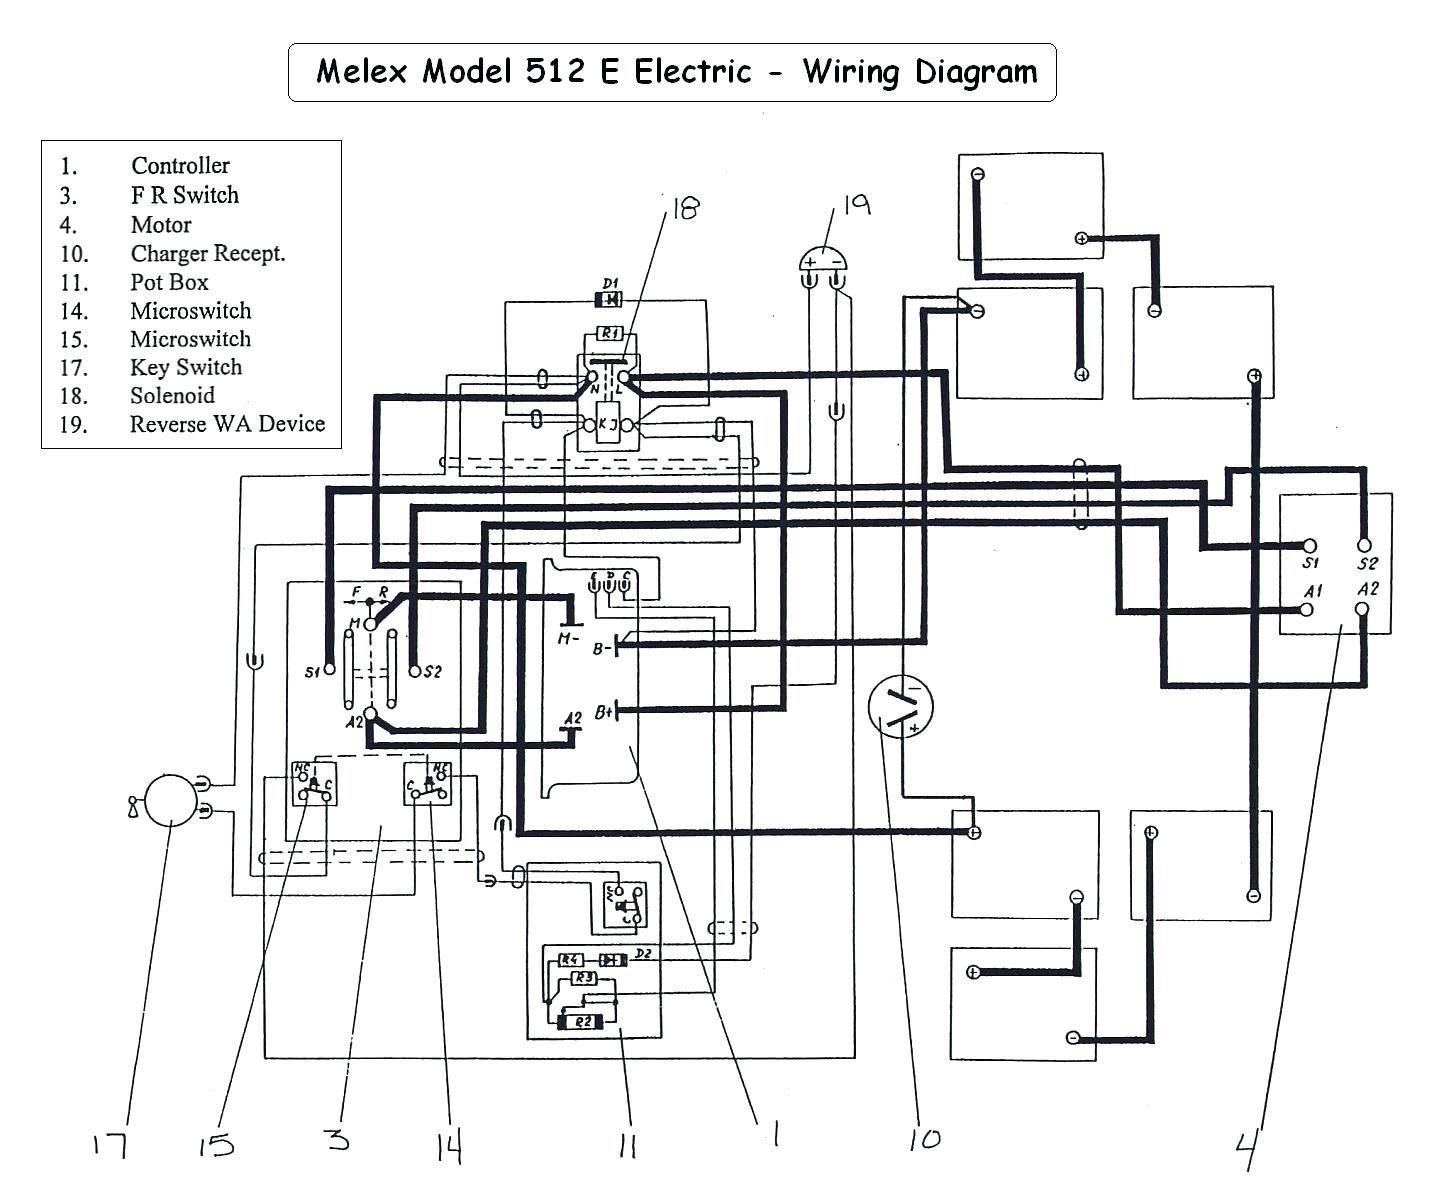 Outstanding 1992 Ezgo Gas Golf Cart Wiring Diagram